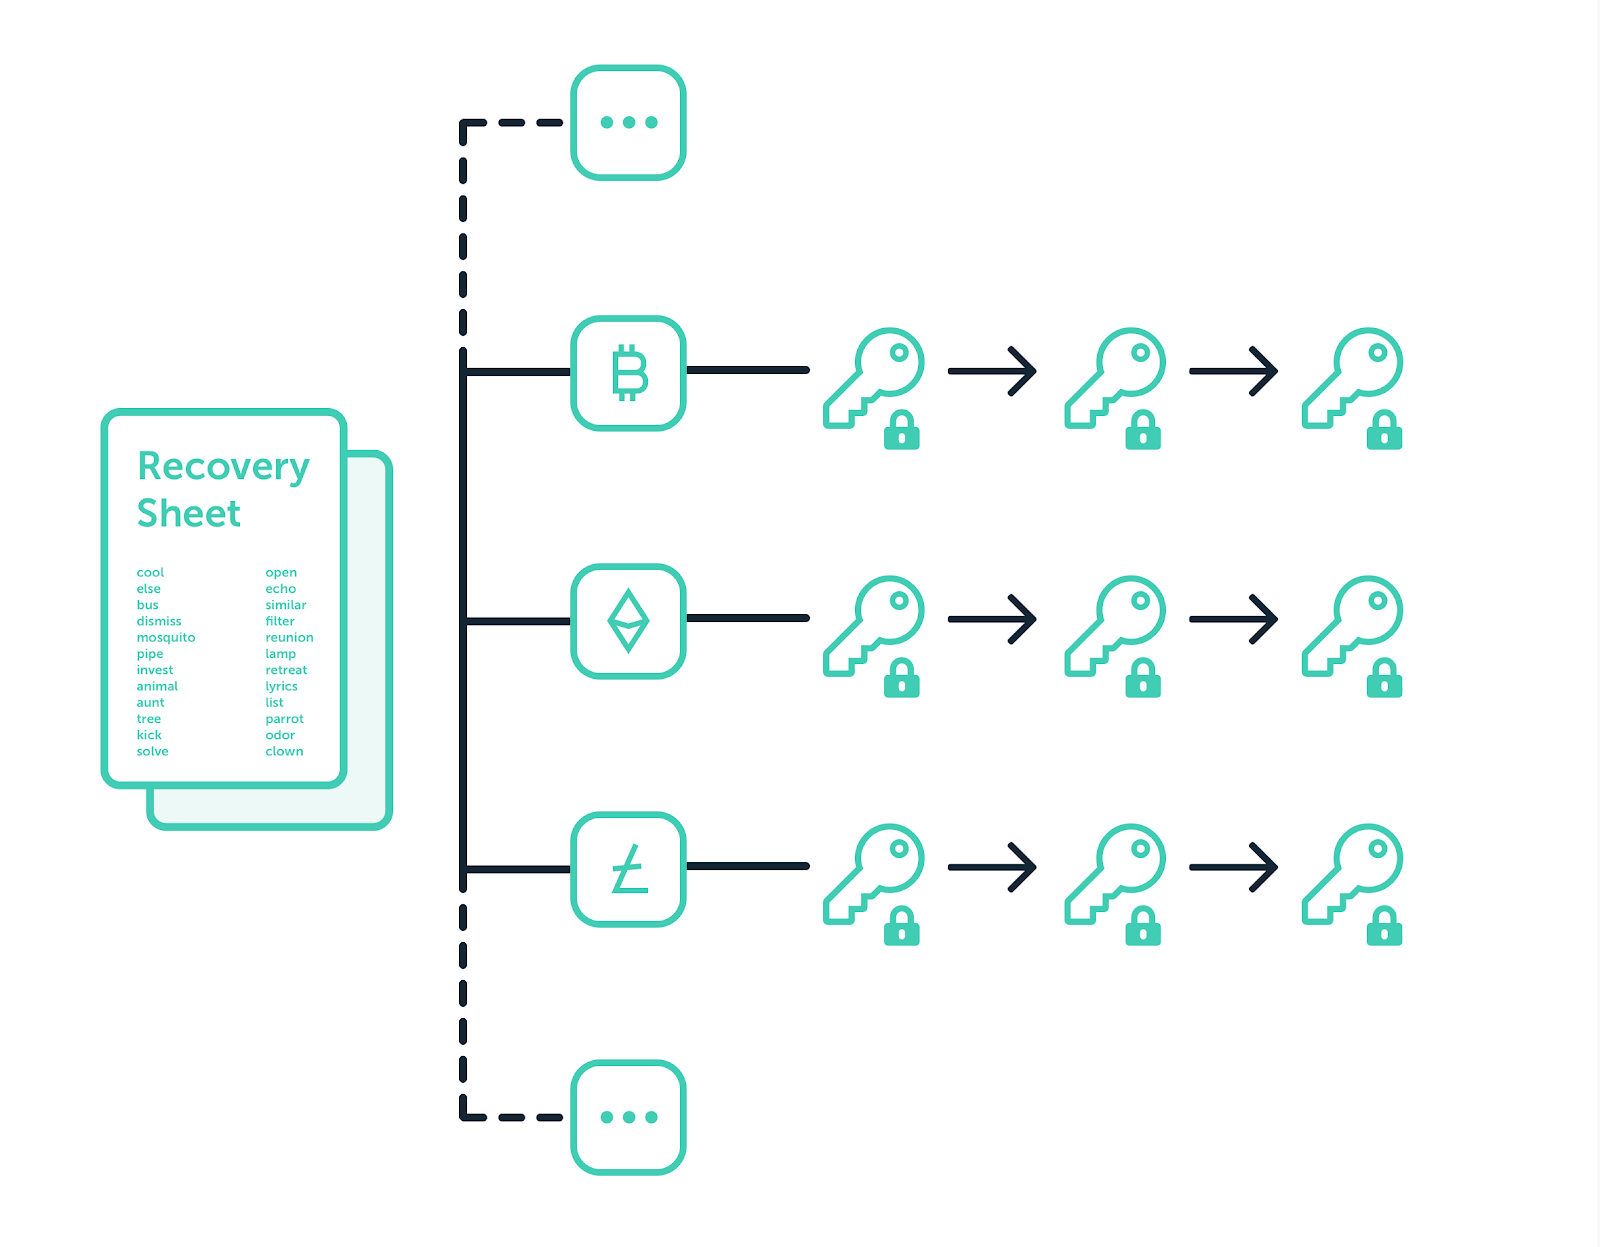 Back to Basics - Part 2: An Infinite Number of Keys - Ledger